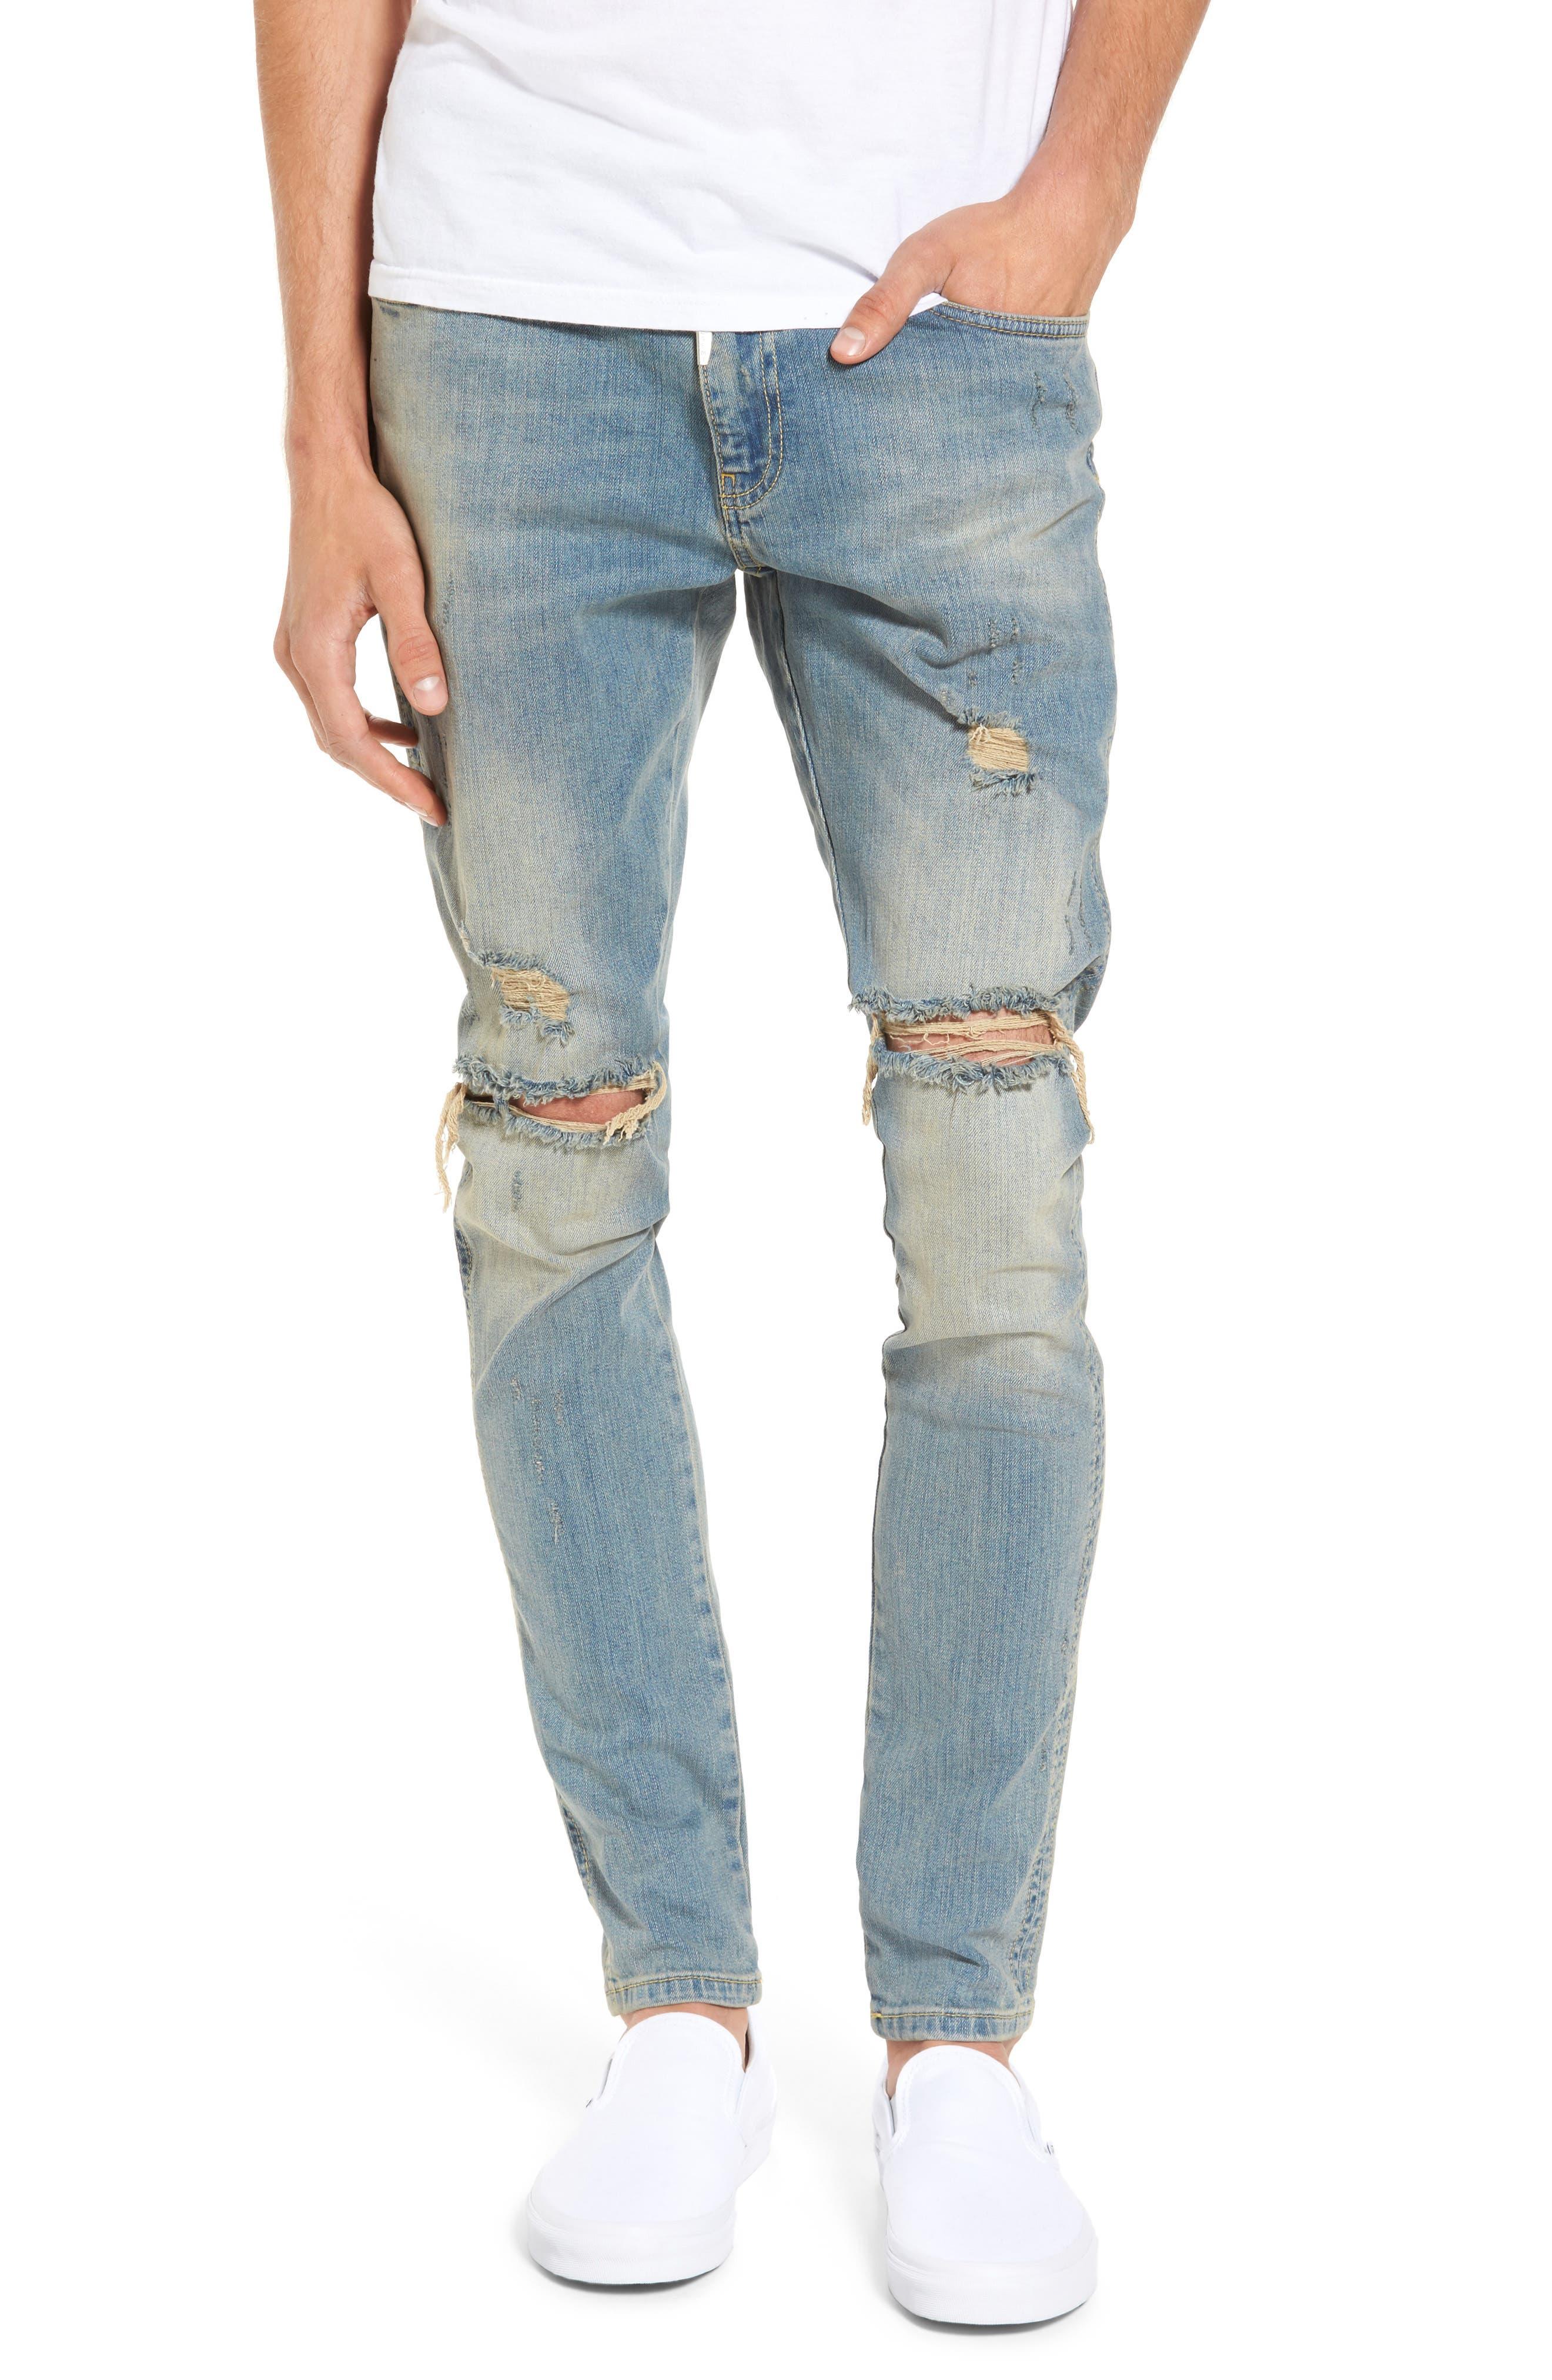 Alternate Image 1 Selected - Represent Slim Fit Destroyed Jeans